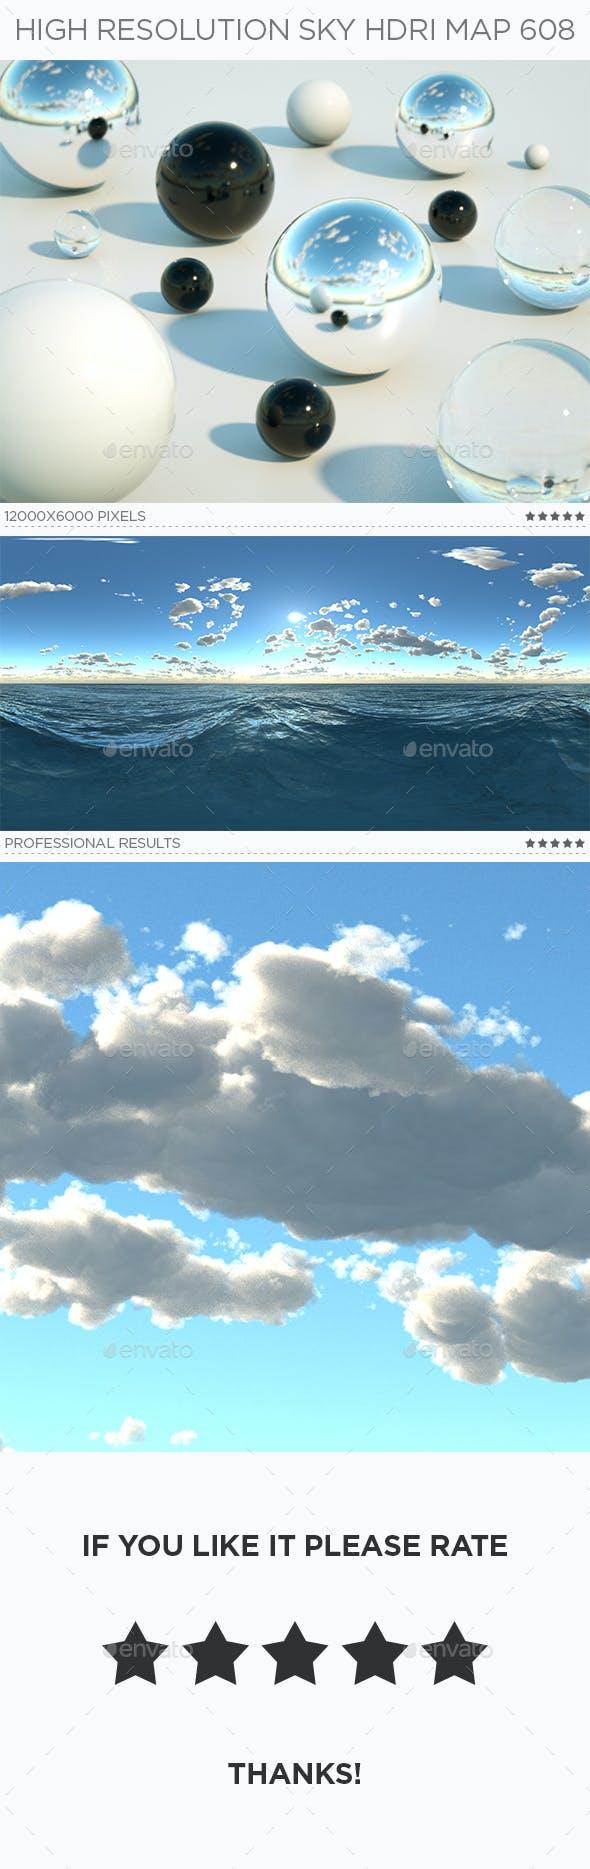 High Resolution Sky HDRi Map 608 - 3DOcean Item for Sale